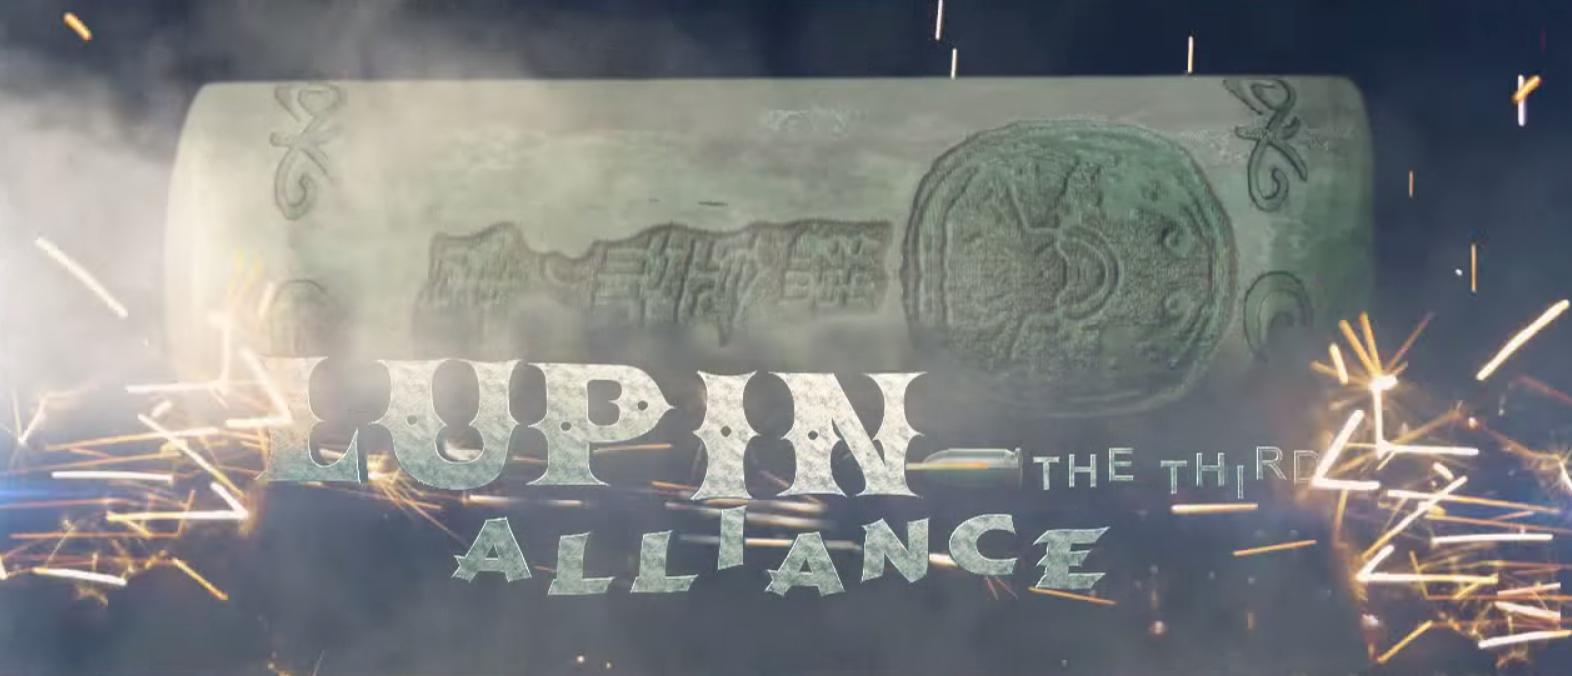 Lupin the third: Alliance - Teaser